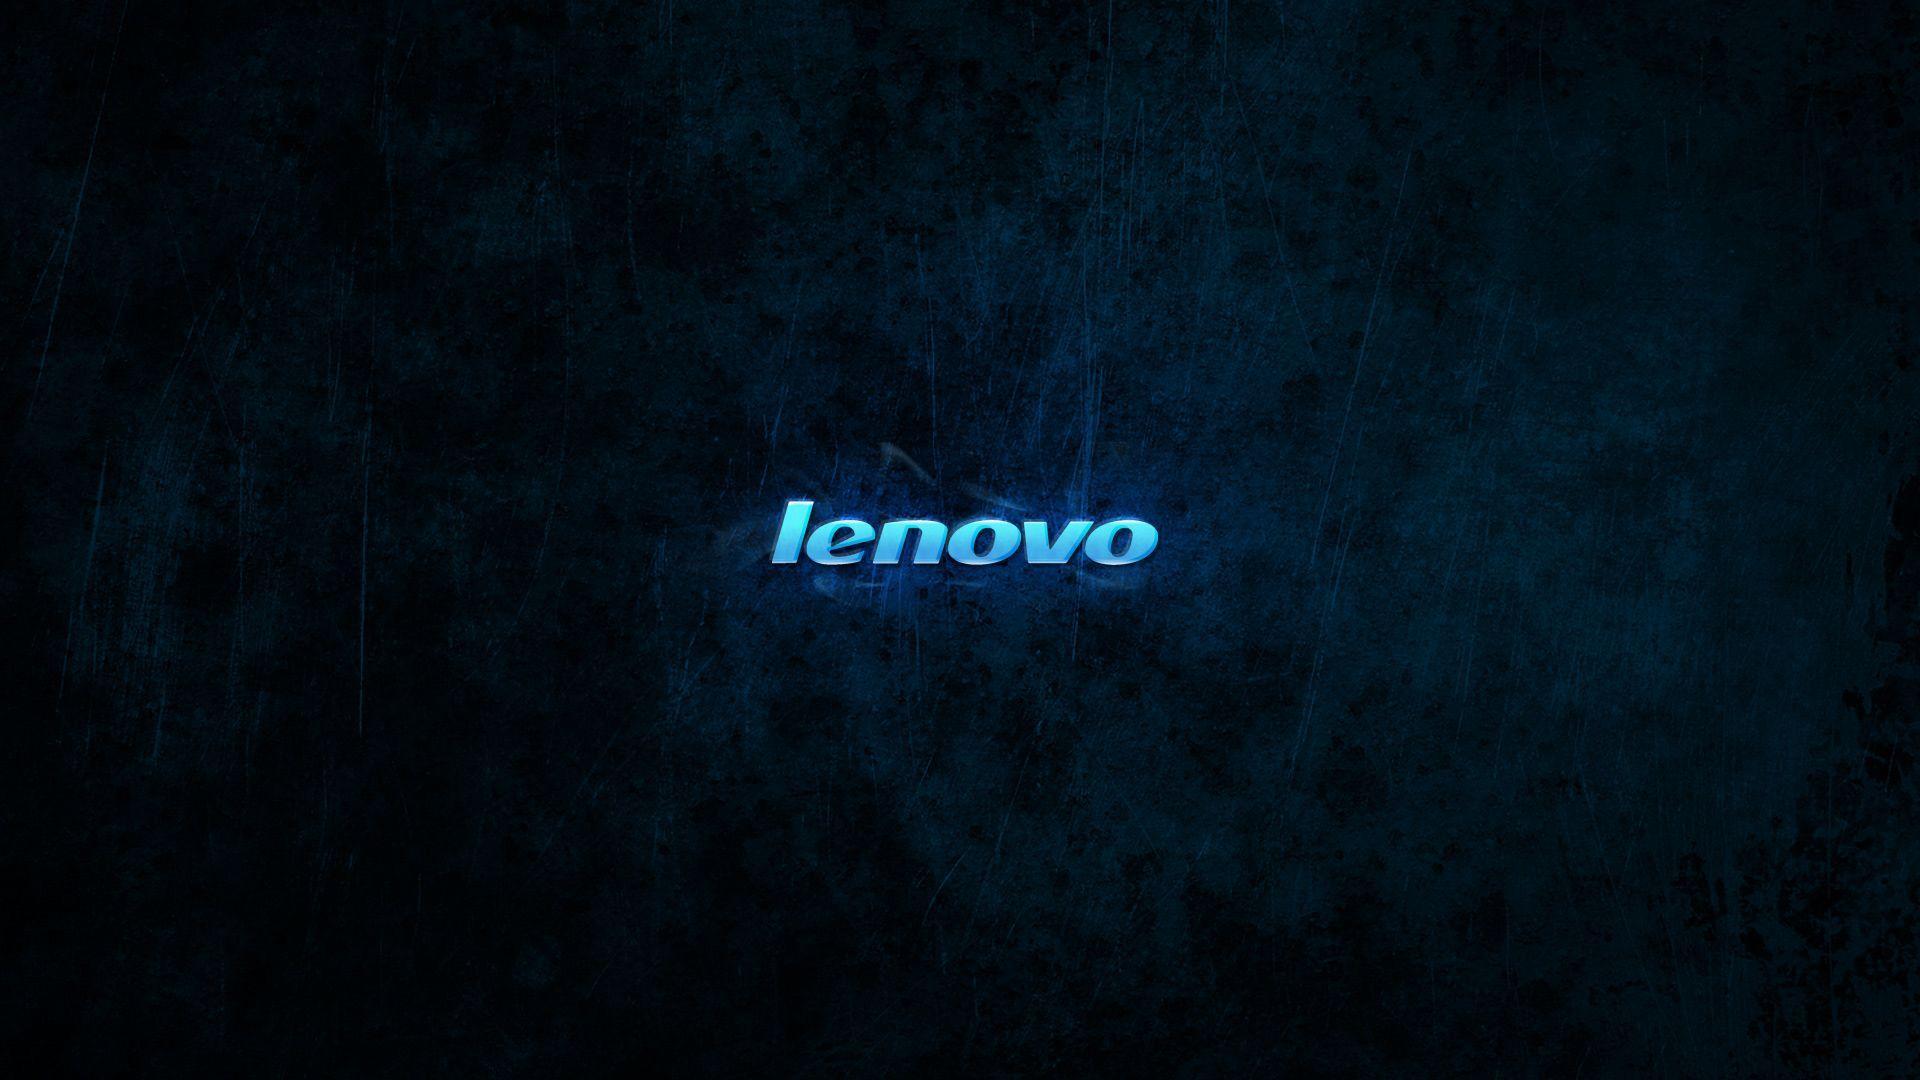 Lenovo Black Wallpapers Top Free Lenovo Black Backgrounds